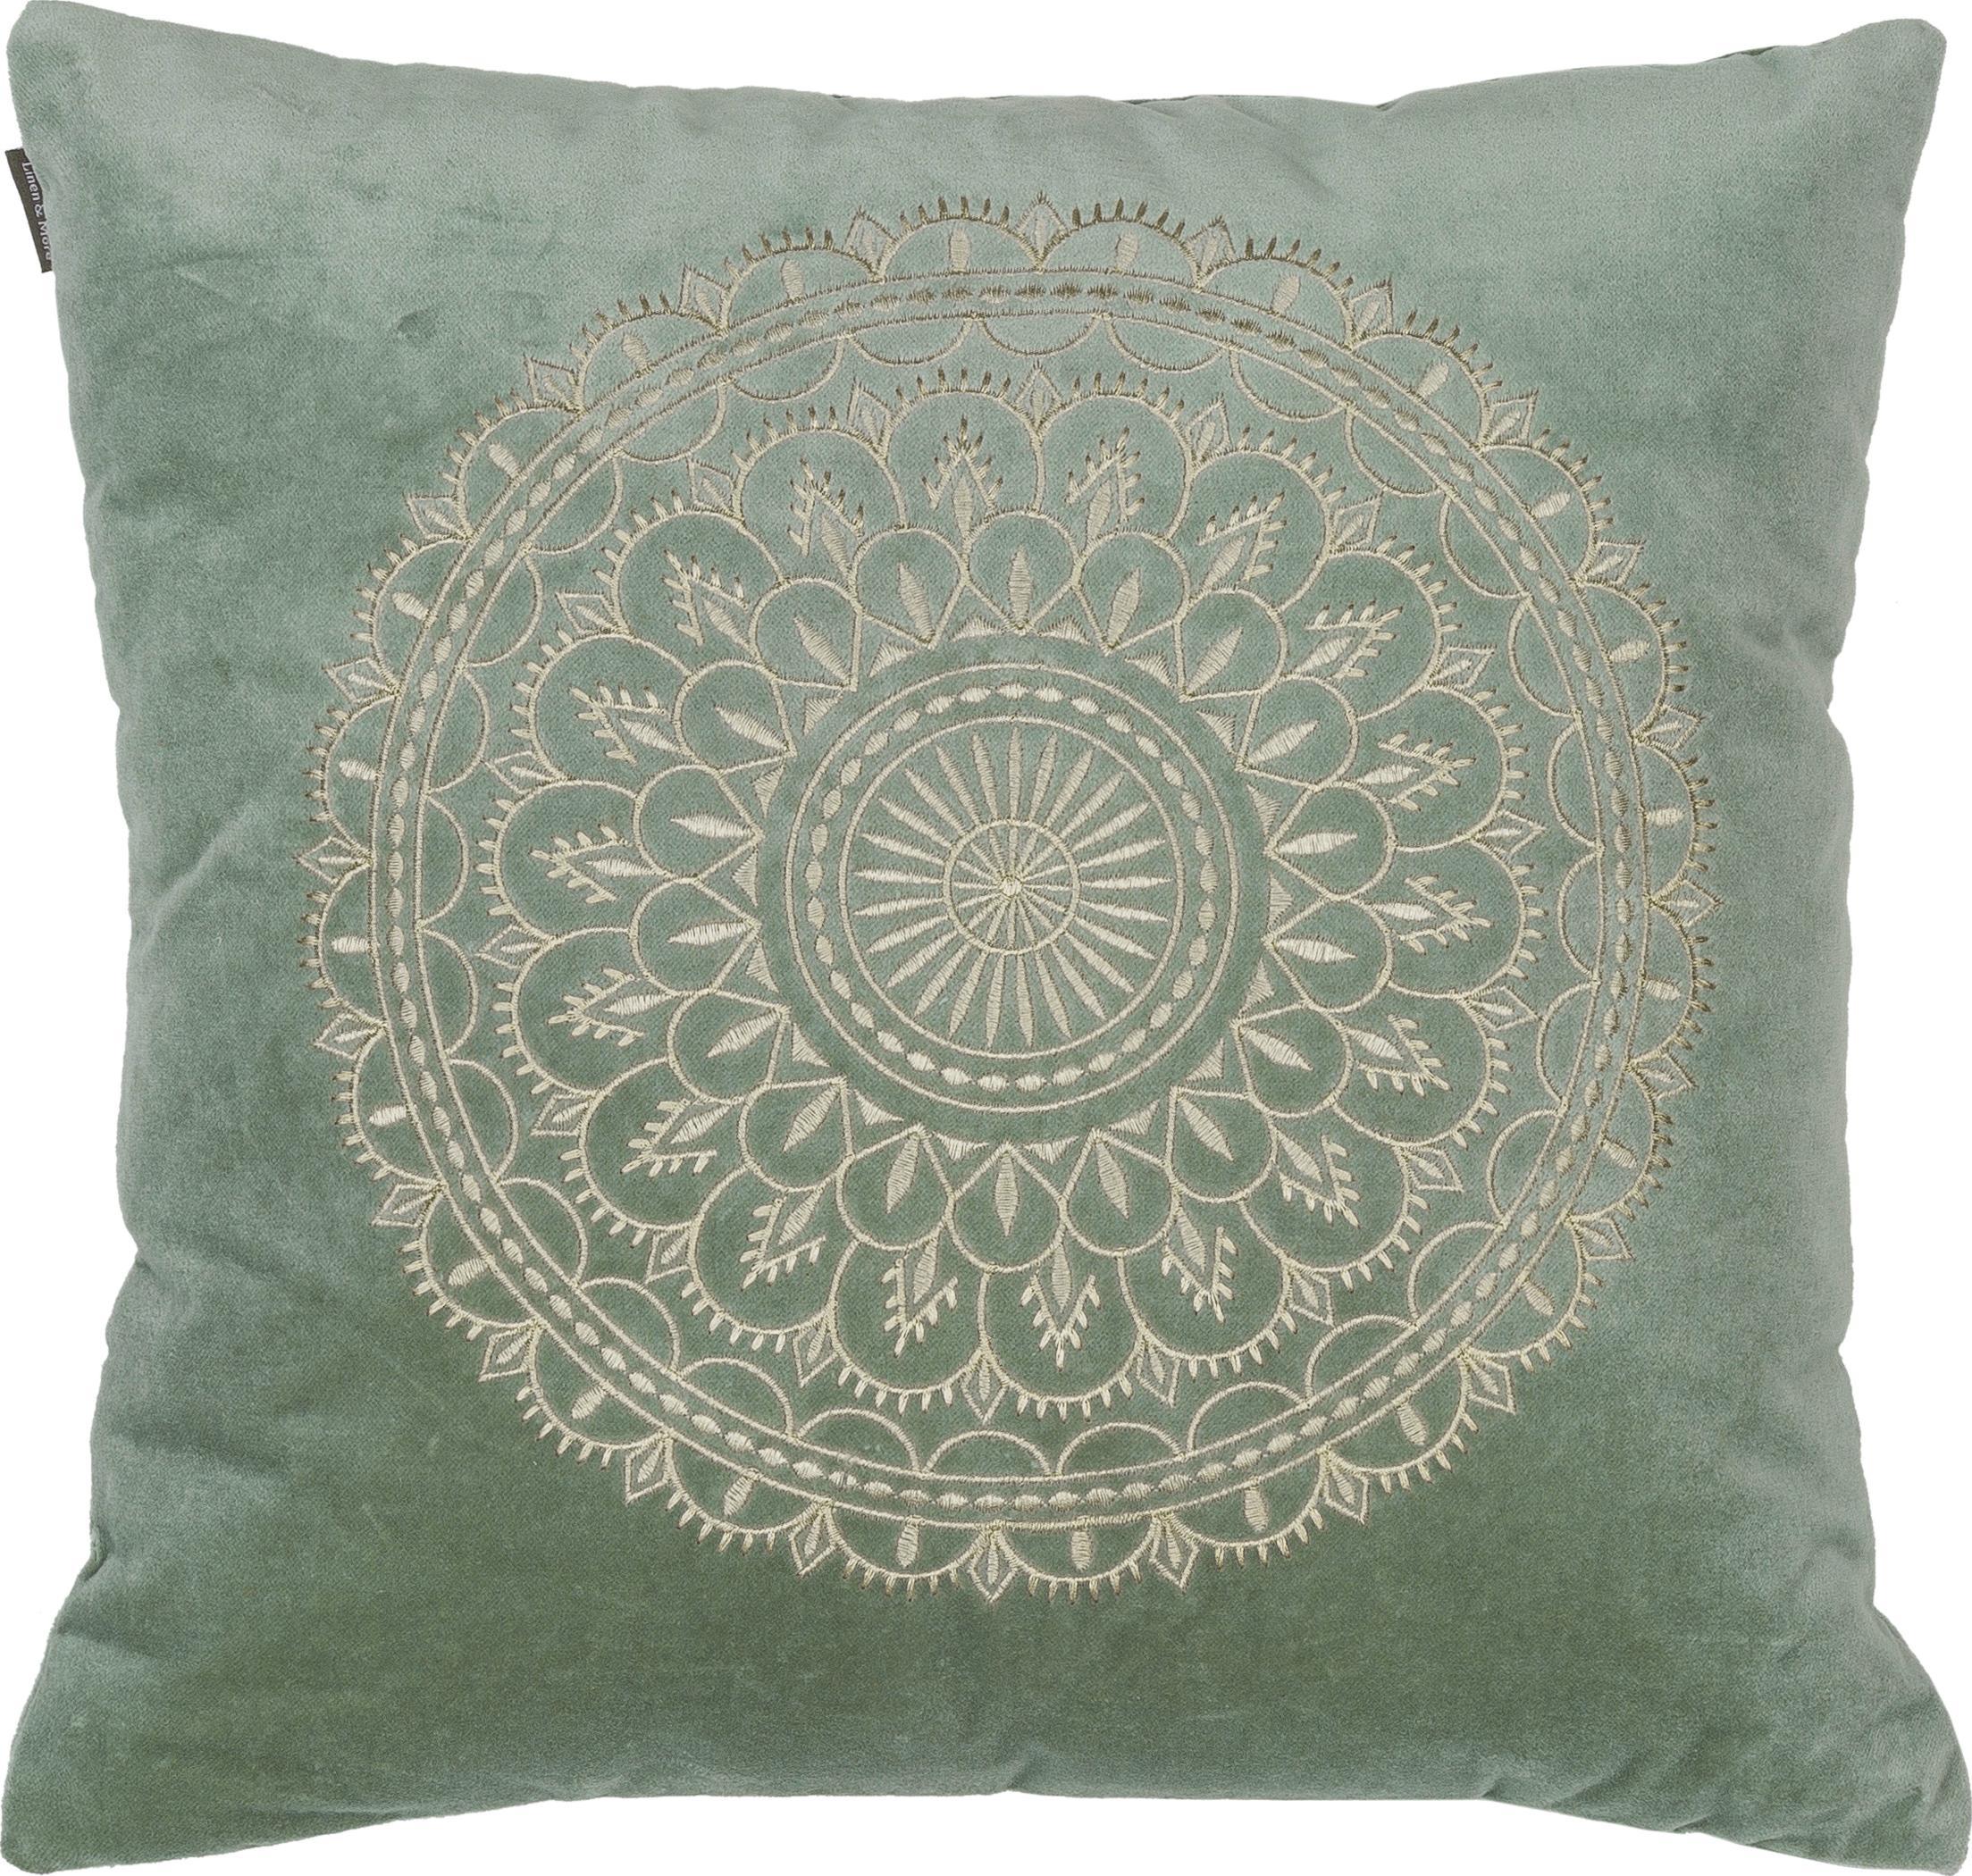 Cojín de terciopelo bordado Preston, con relleno, Funda: terciopelo 100%algodón, Verde menta, crema, An 45 x L 45 cm